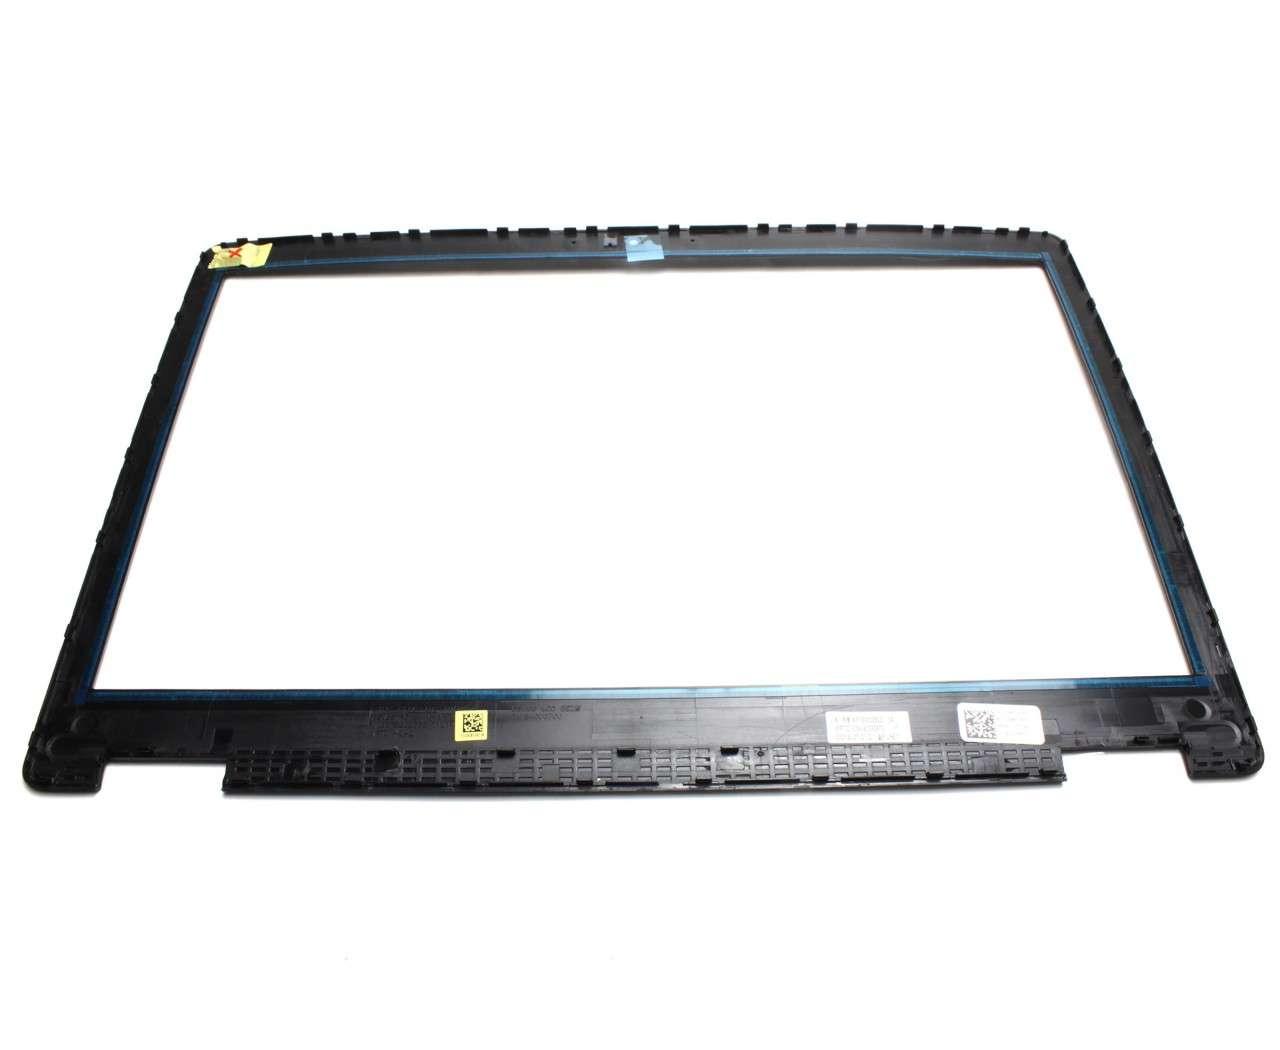 Rama Display Dell 0GPM65 Bezel Front Cover Neagra imagine powerlaptop.ro 2021